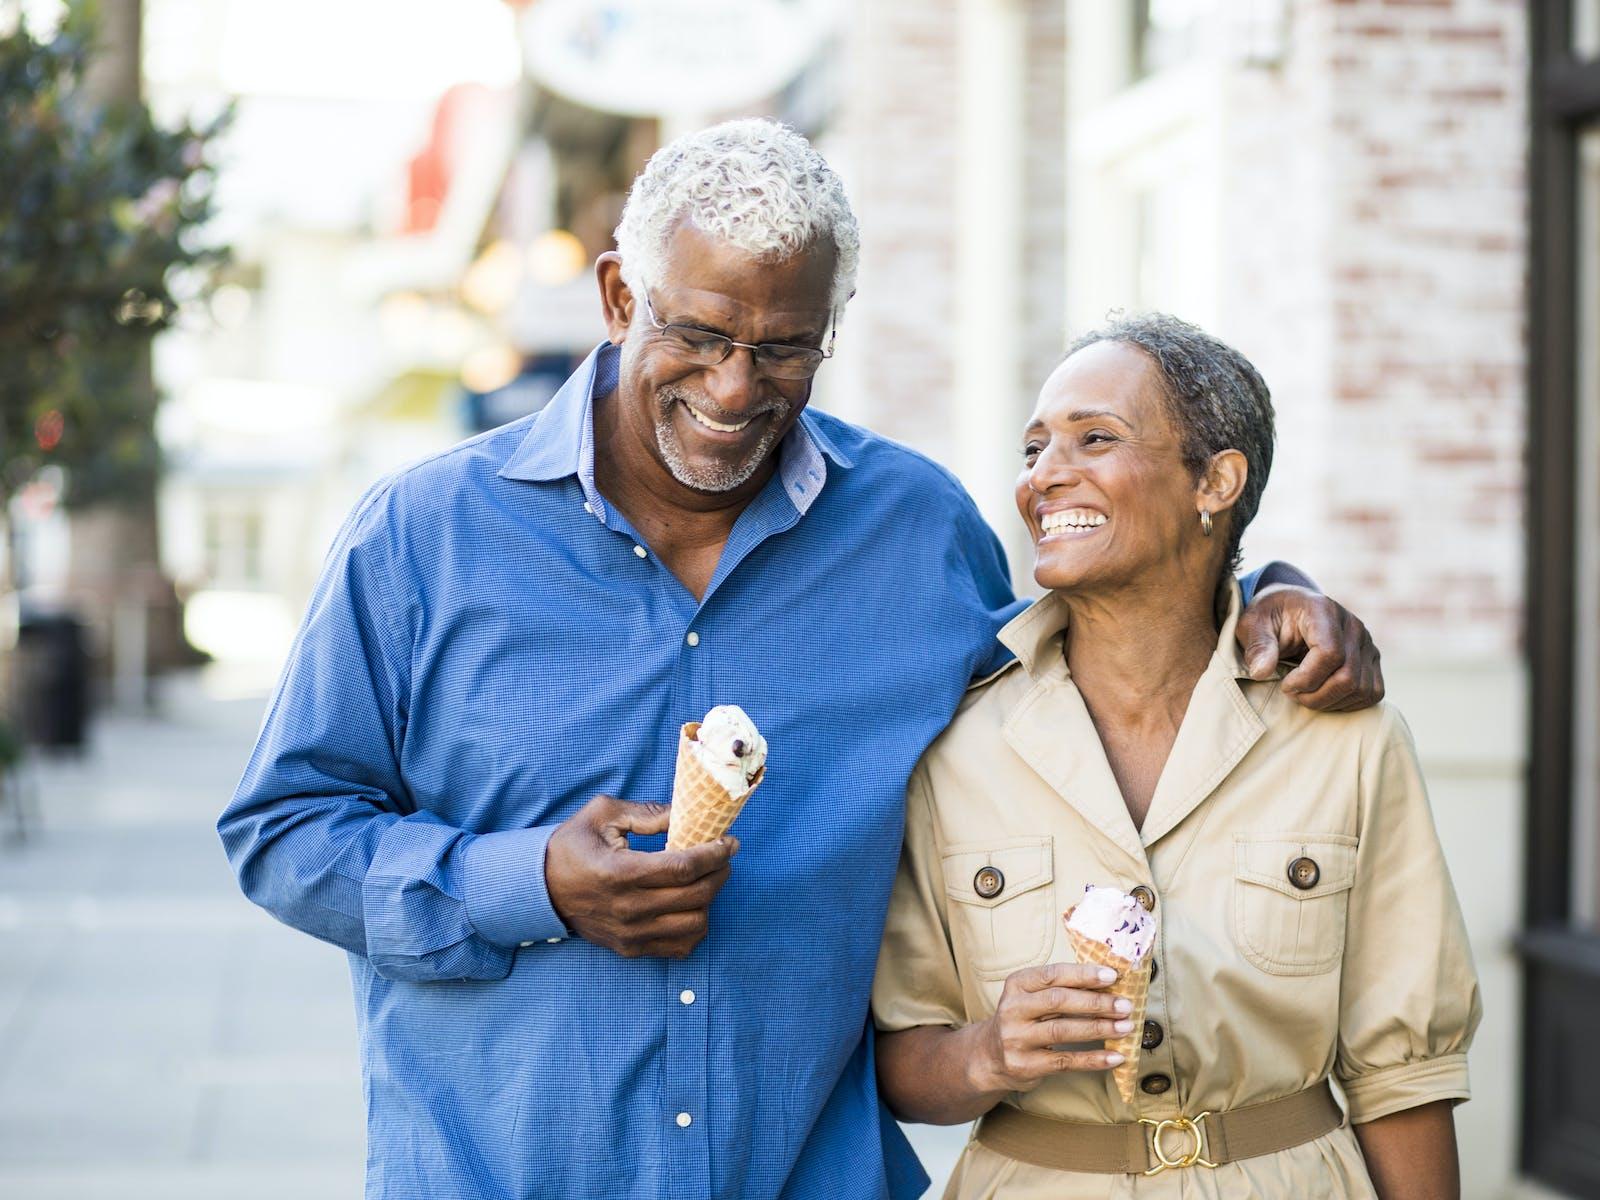 An older couple enjoying ice cream